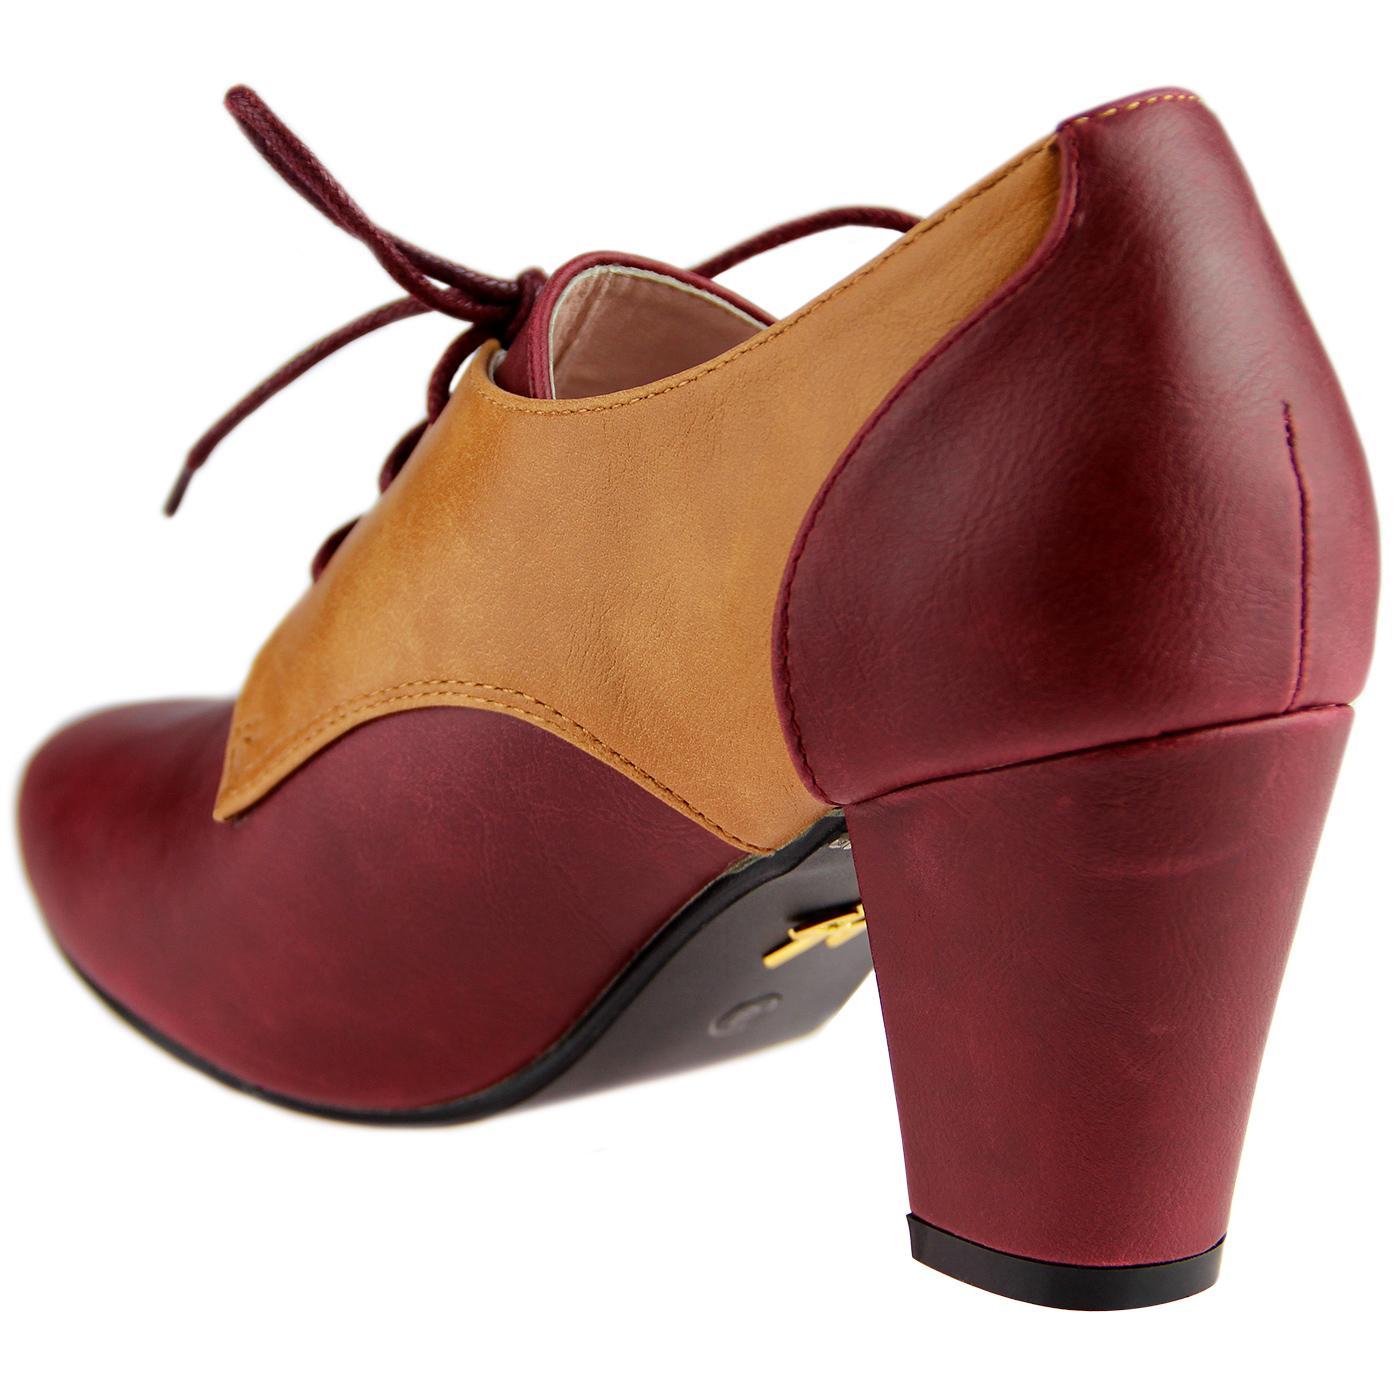 bad891cc2434 LULU HUN Vera Vintage 1940s Oxford Heels Burgundy